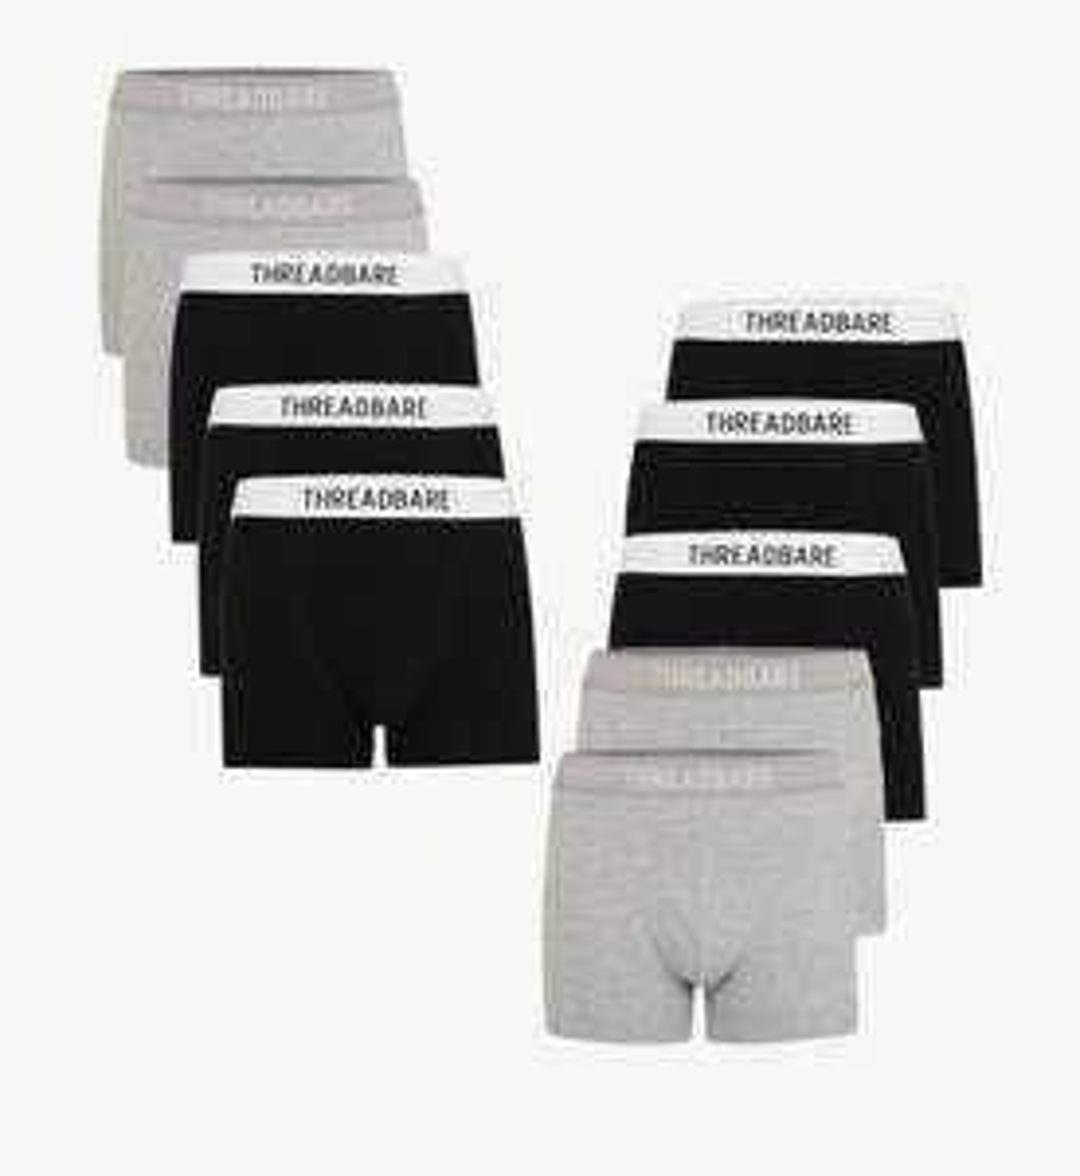 10 Pack of Threadbare Underpants Now €19.95 @ Zalando